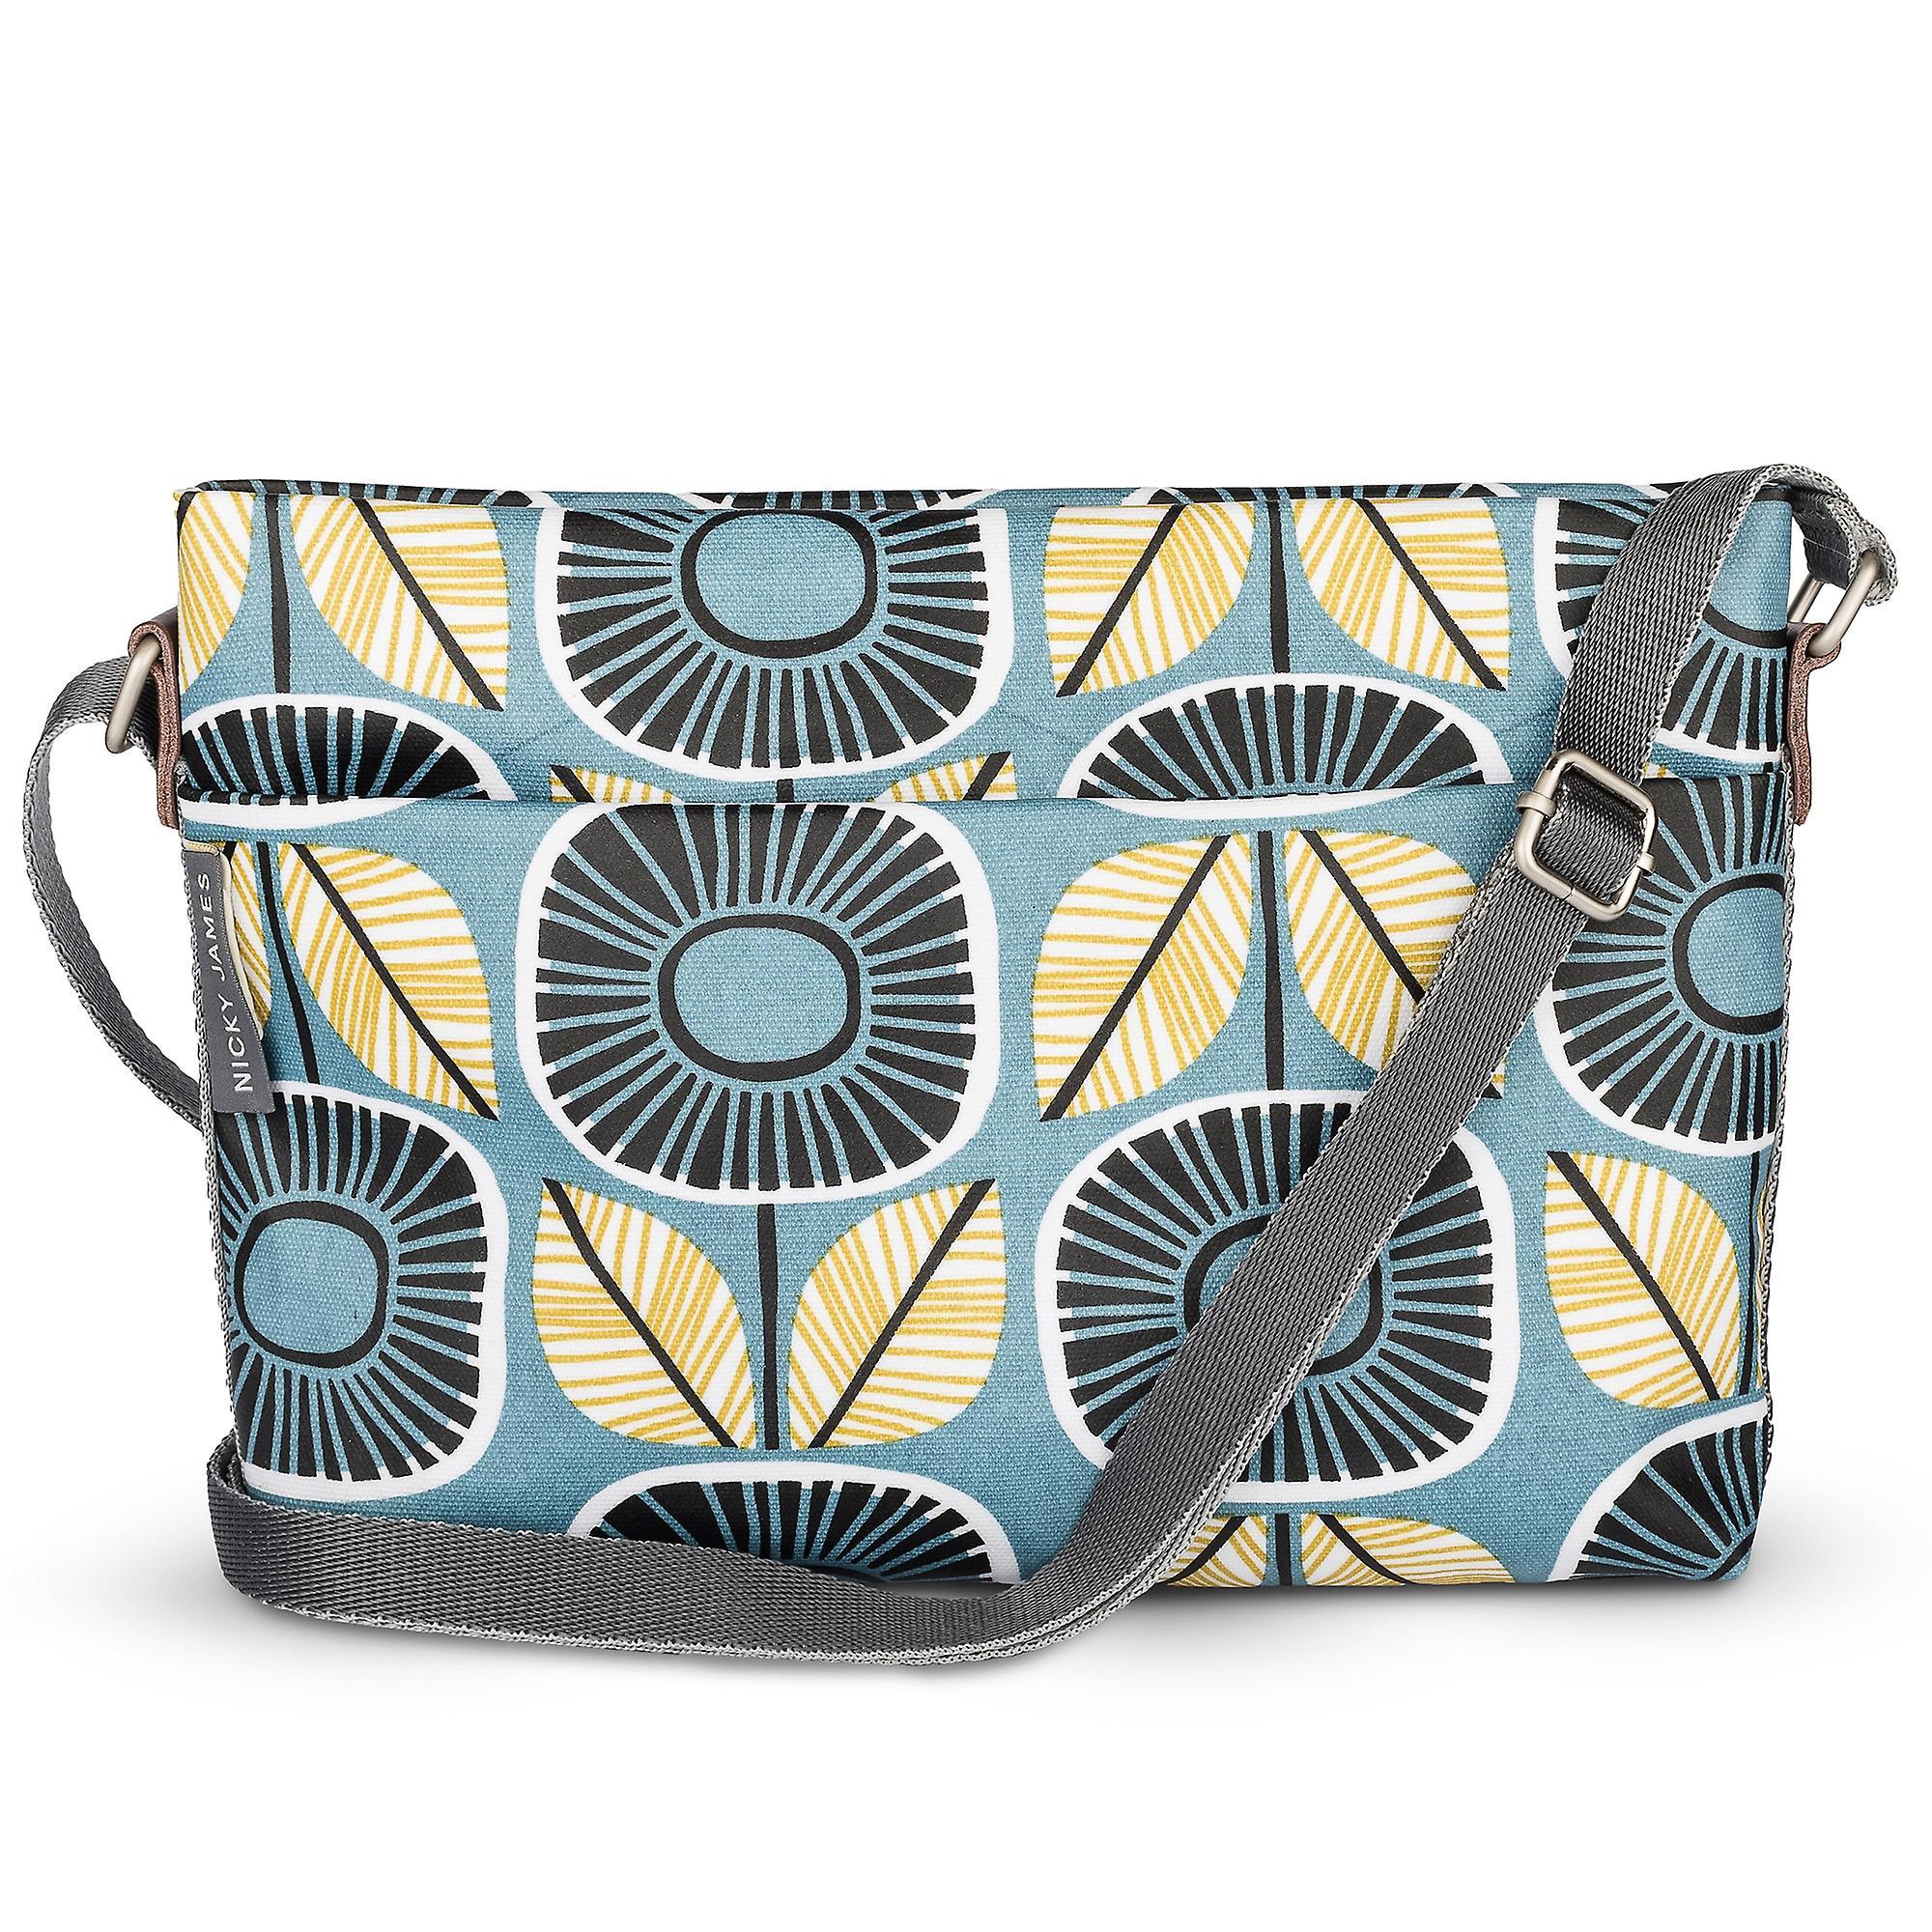 Nicky James Sunflower Day Bag